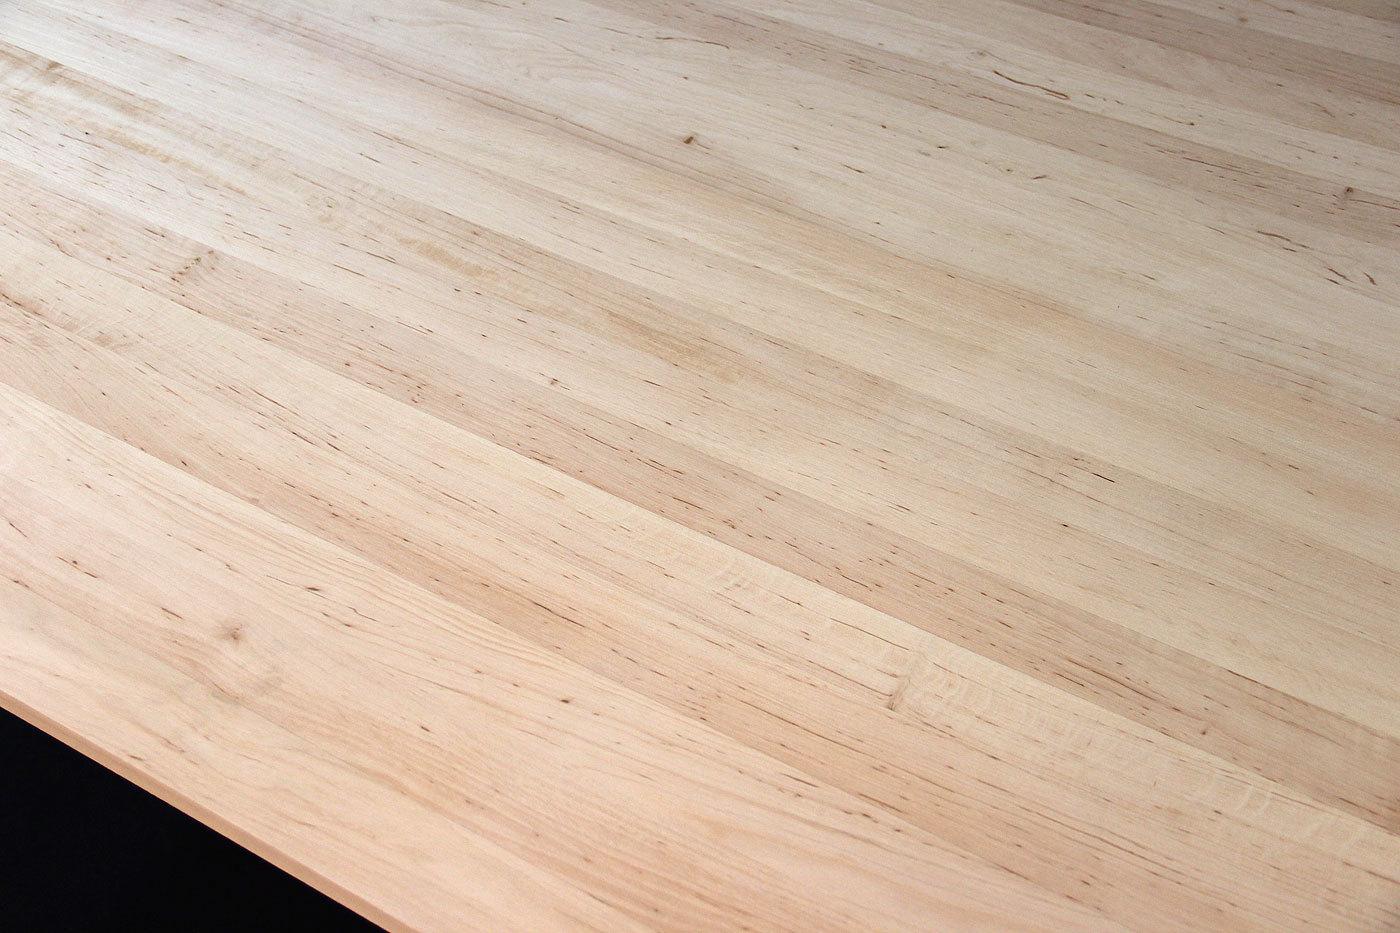 Mobelbauplatte Massivholz Erle Kgz 26 2500 1250